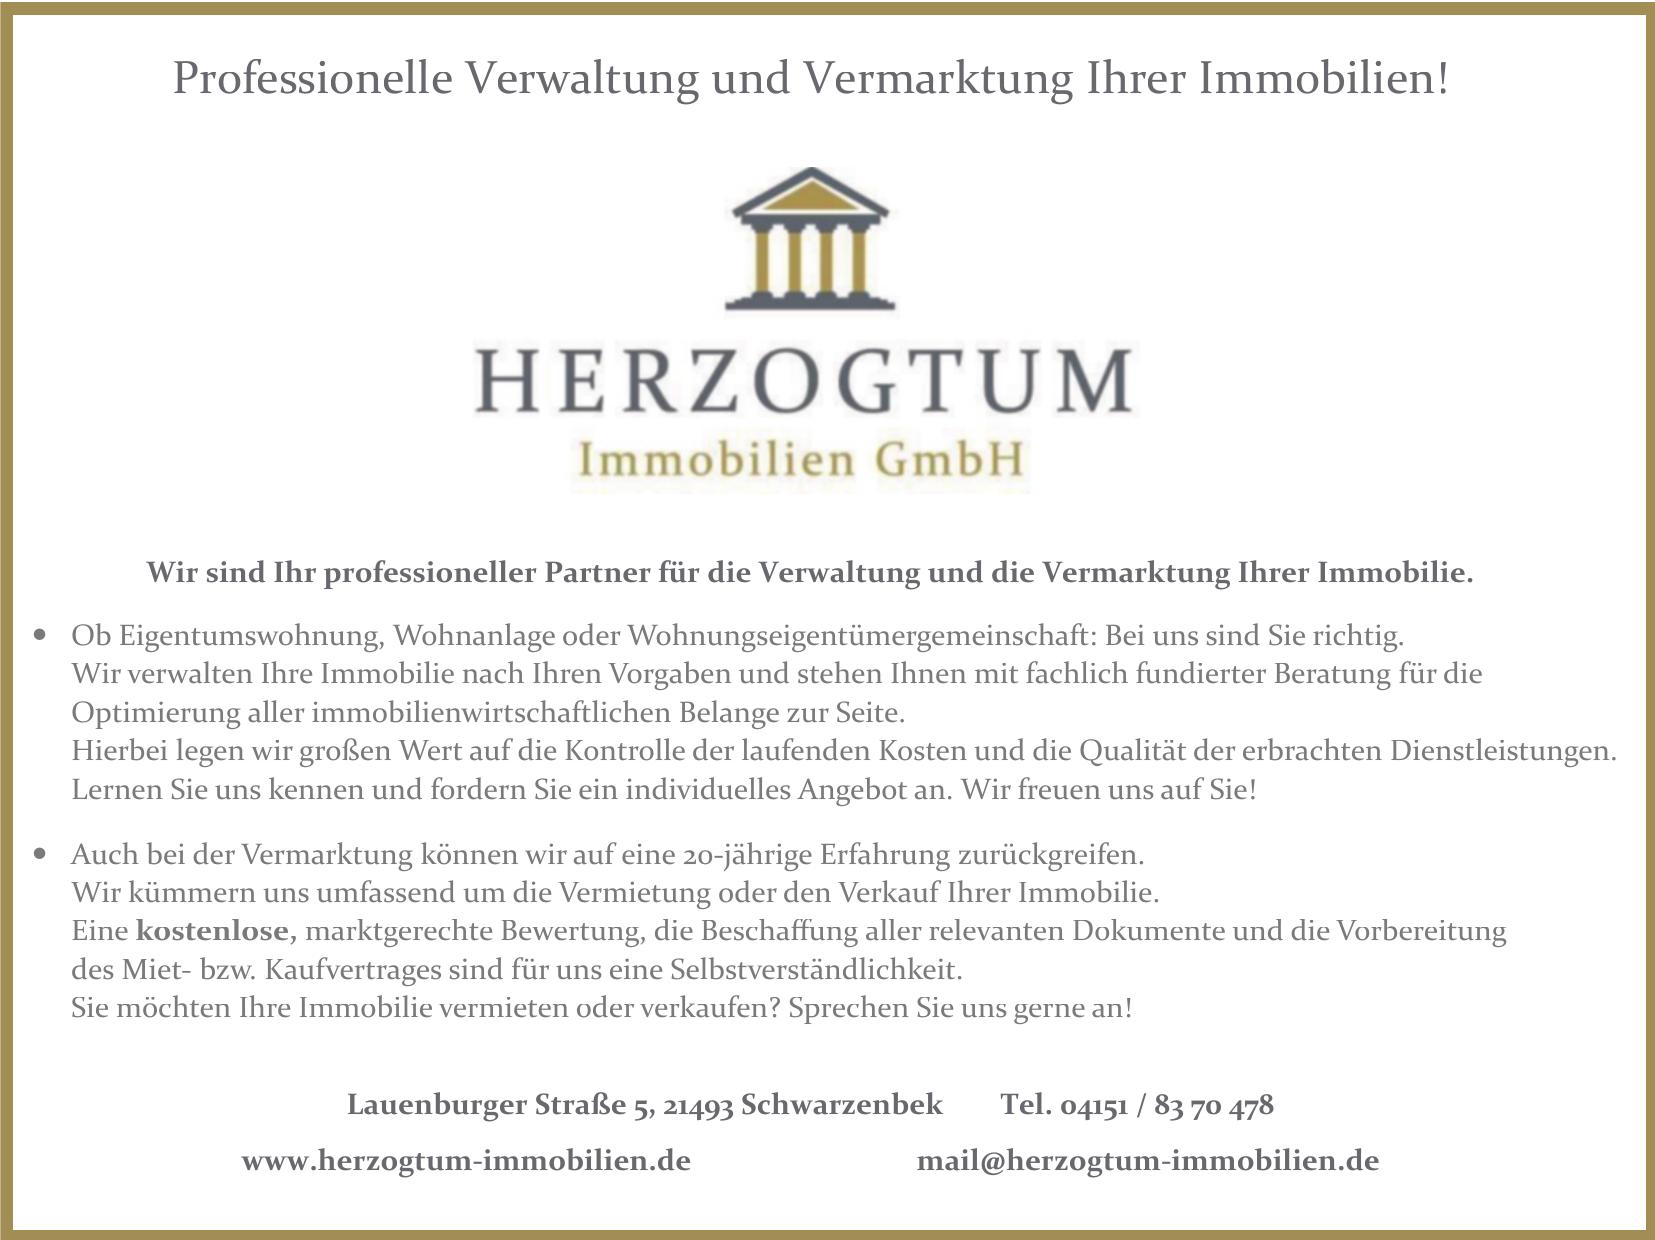 Herzogtum Immobilien GmbH